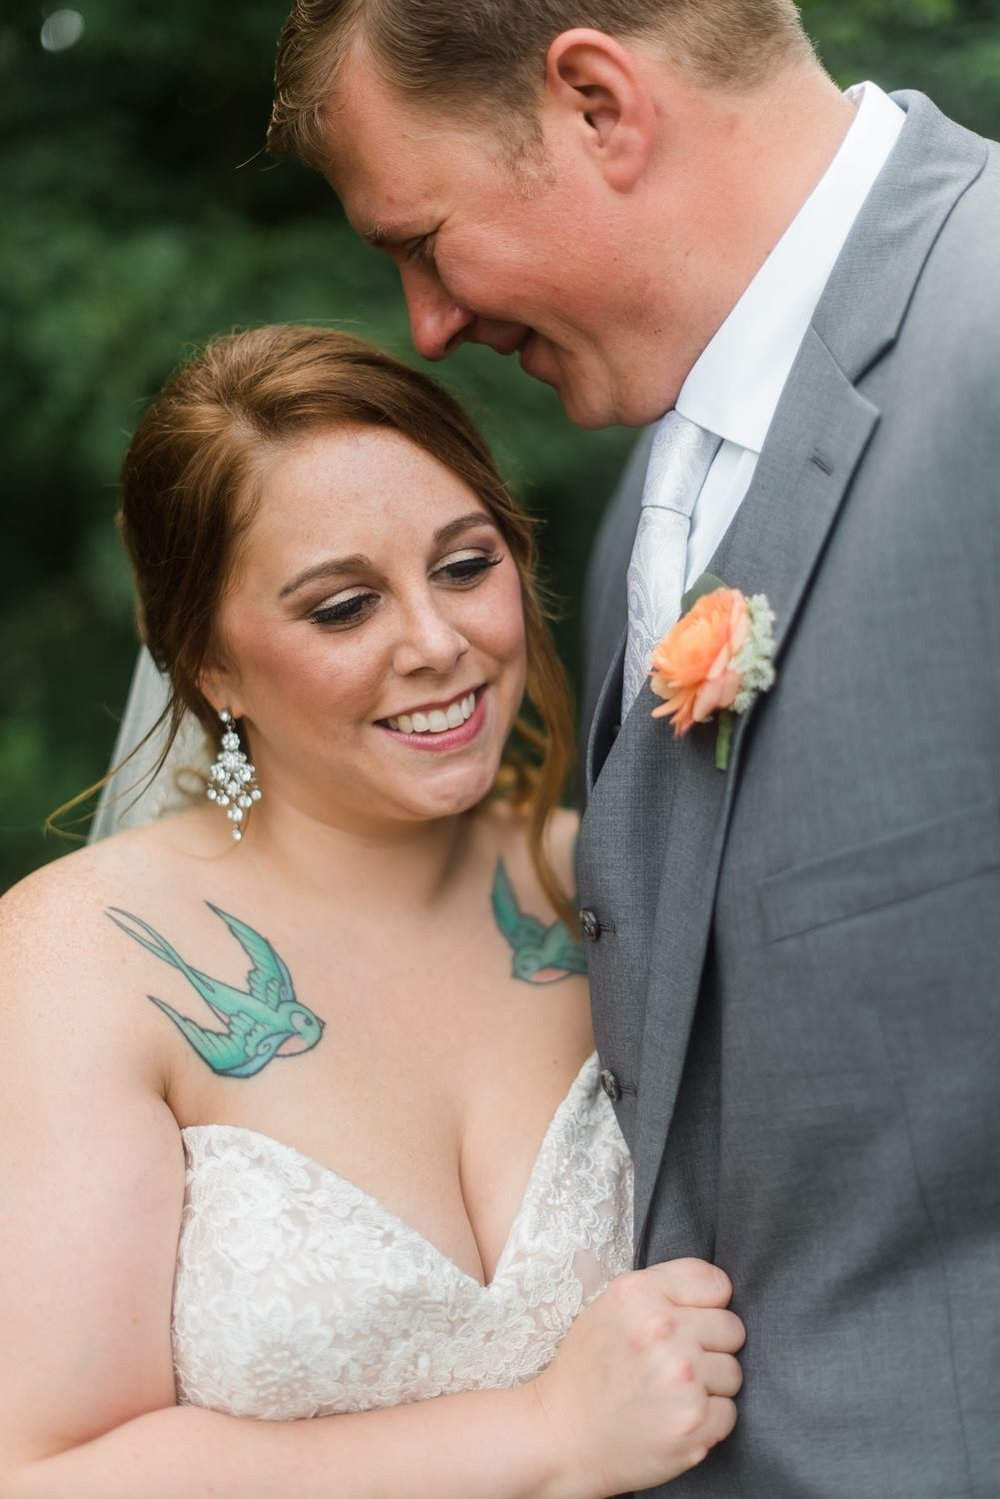 pittsburgh-botanic-garden-wedding-rustic-romantic-pennsylvania-0014.jpg